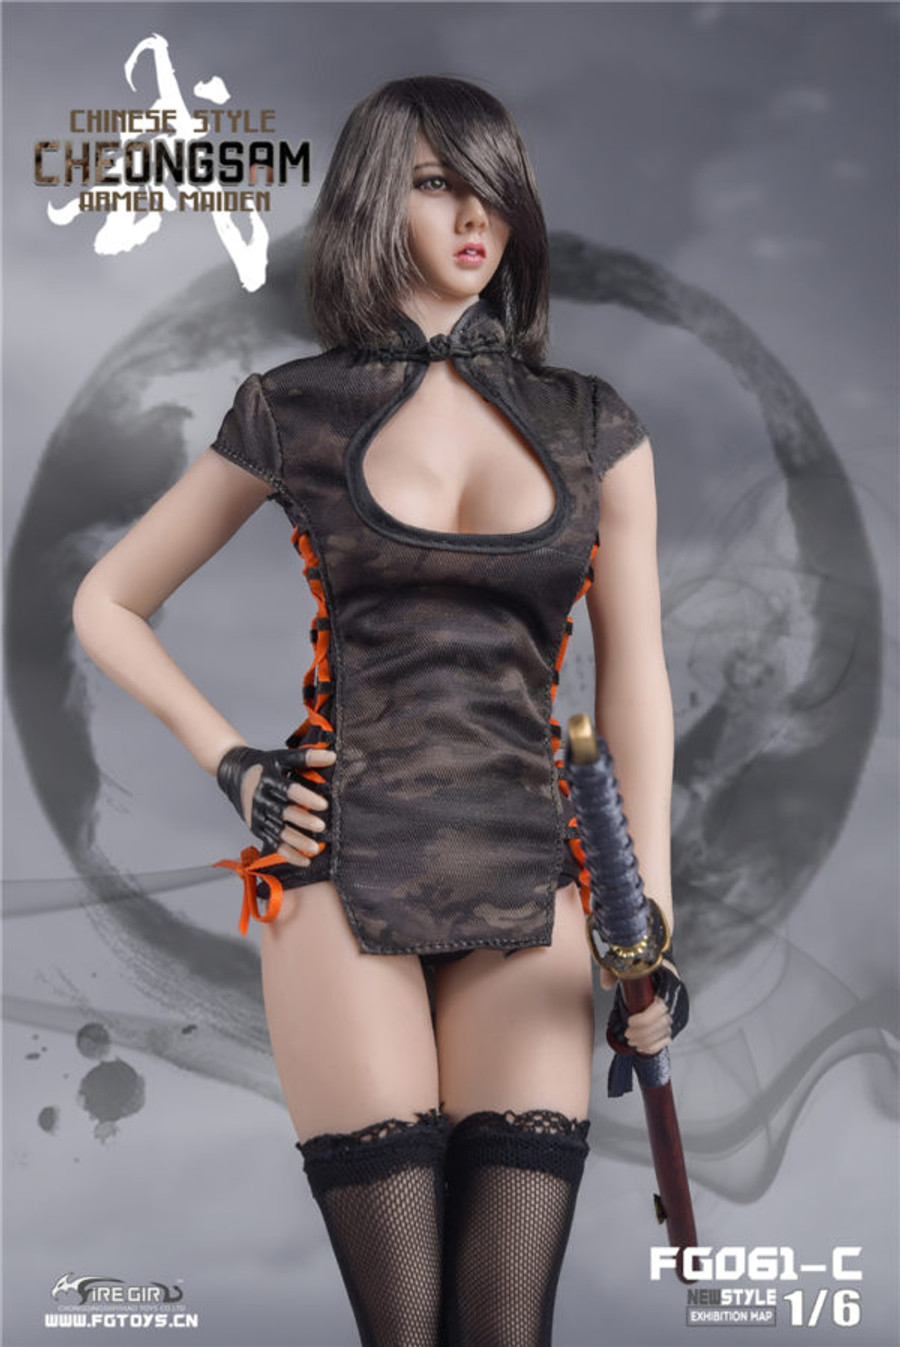 Fire Girl Toys - Combat Cheongsam